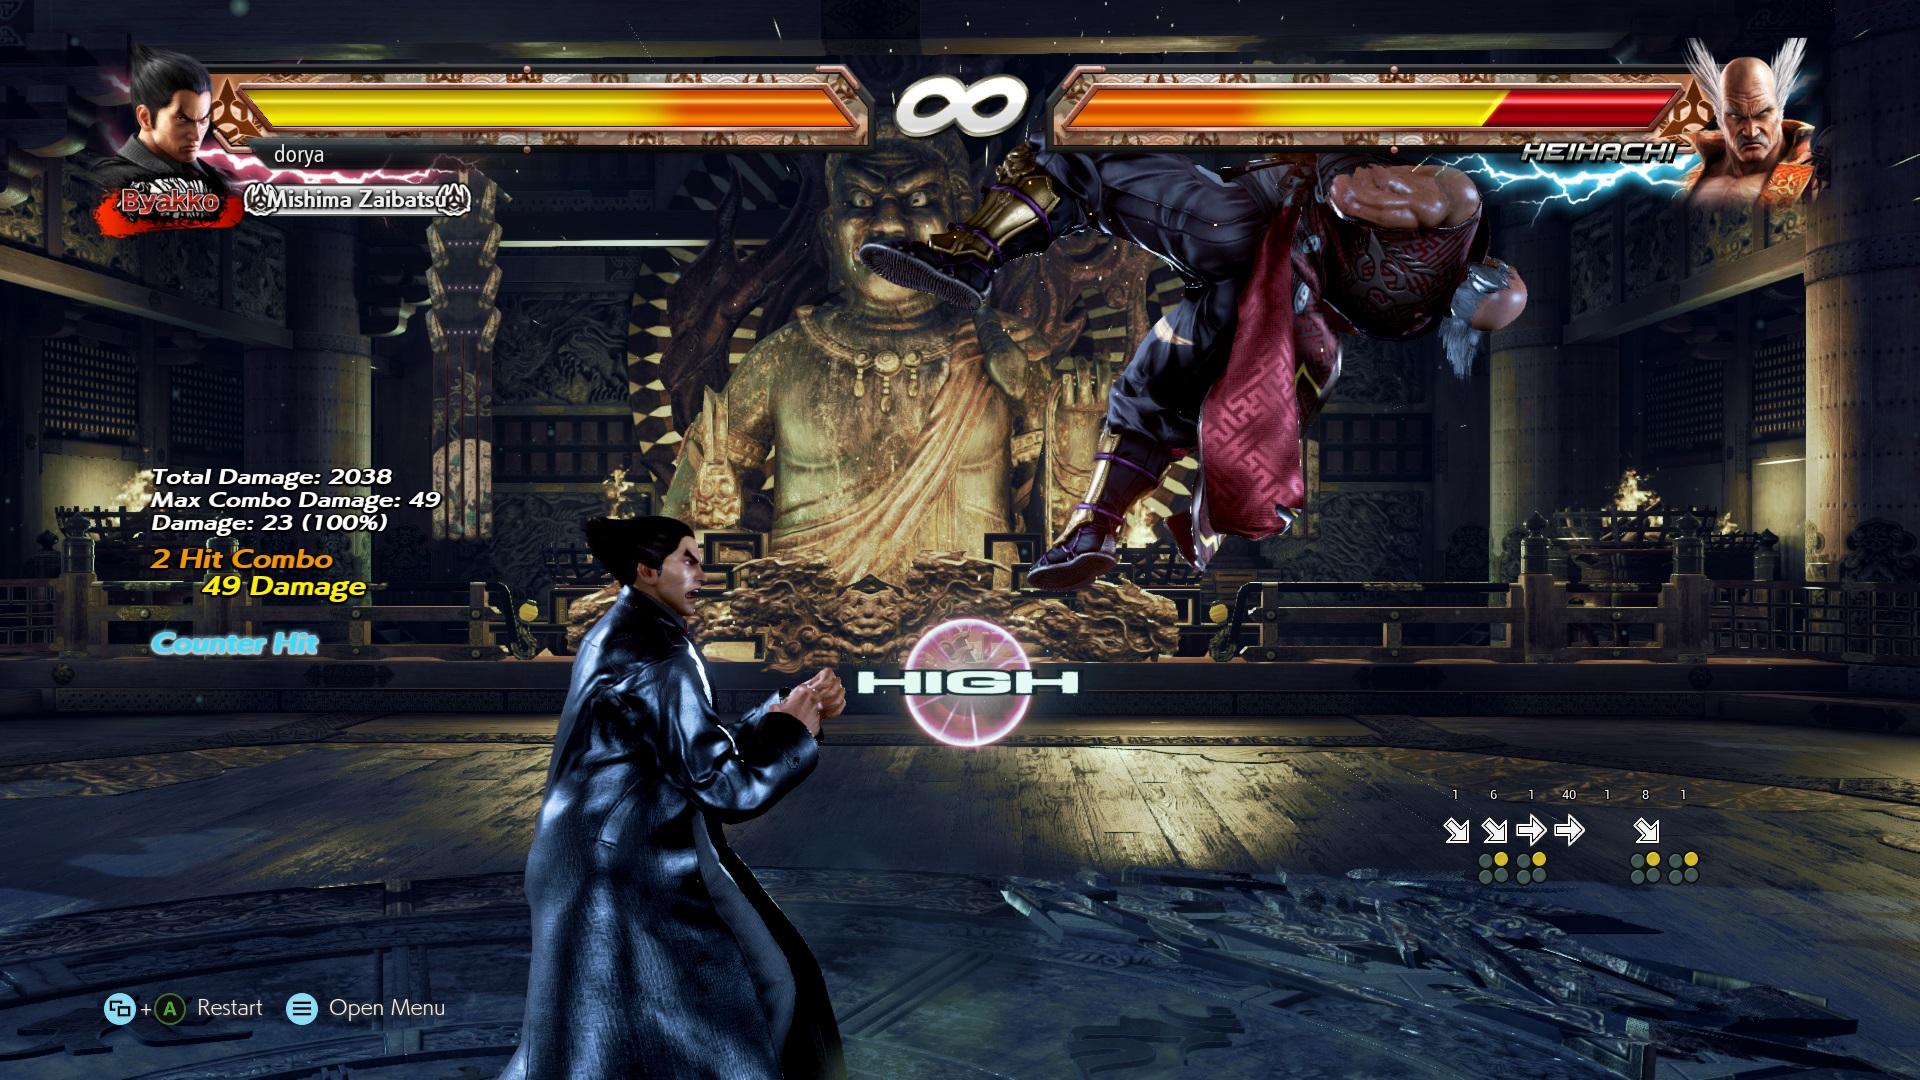 Pc Tekken 7 Input Frame Count Display Mod News Avoiding The Puddle